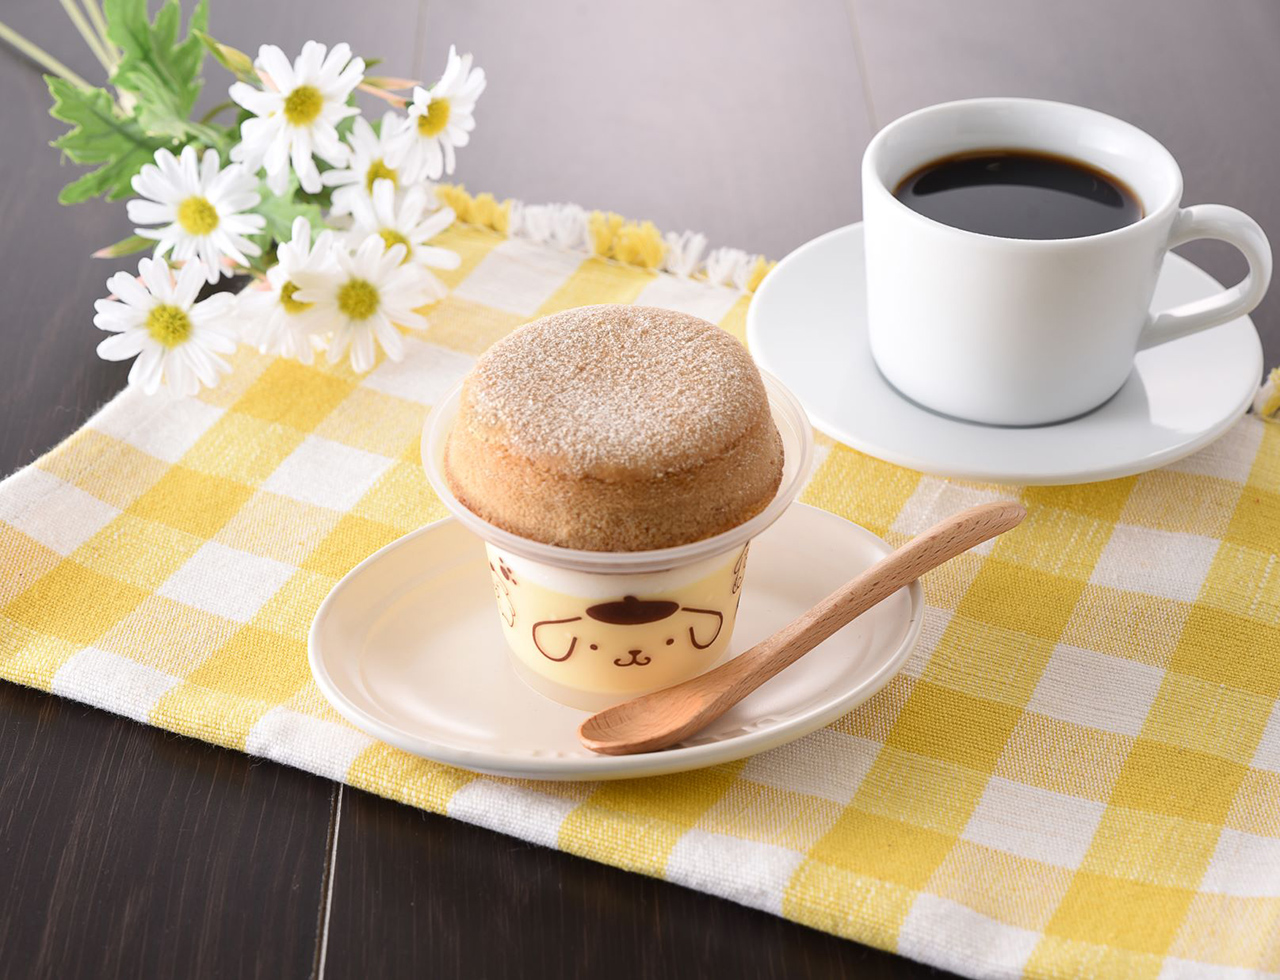 Pompompurin Soufflé Pudding (298 เยน) หาซื้อได้ที่แฟมิลีมาร์ทญี่ปุ่น